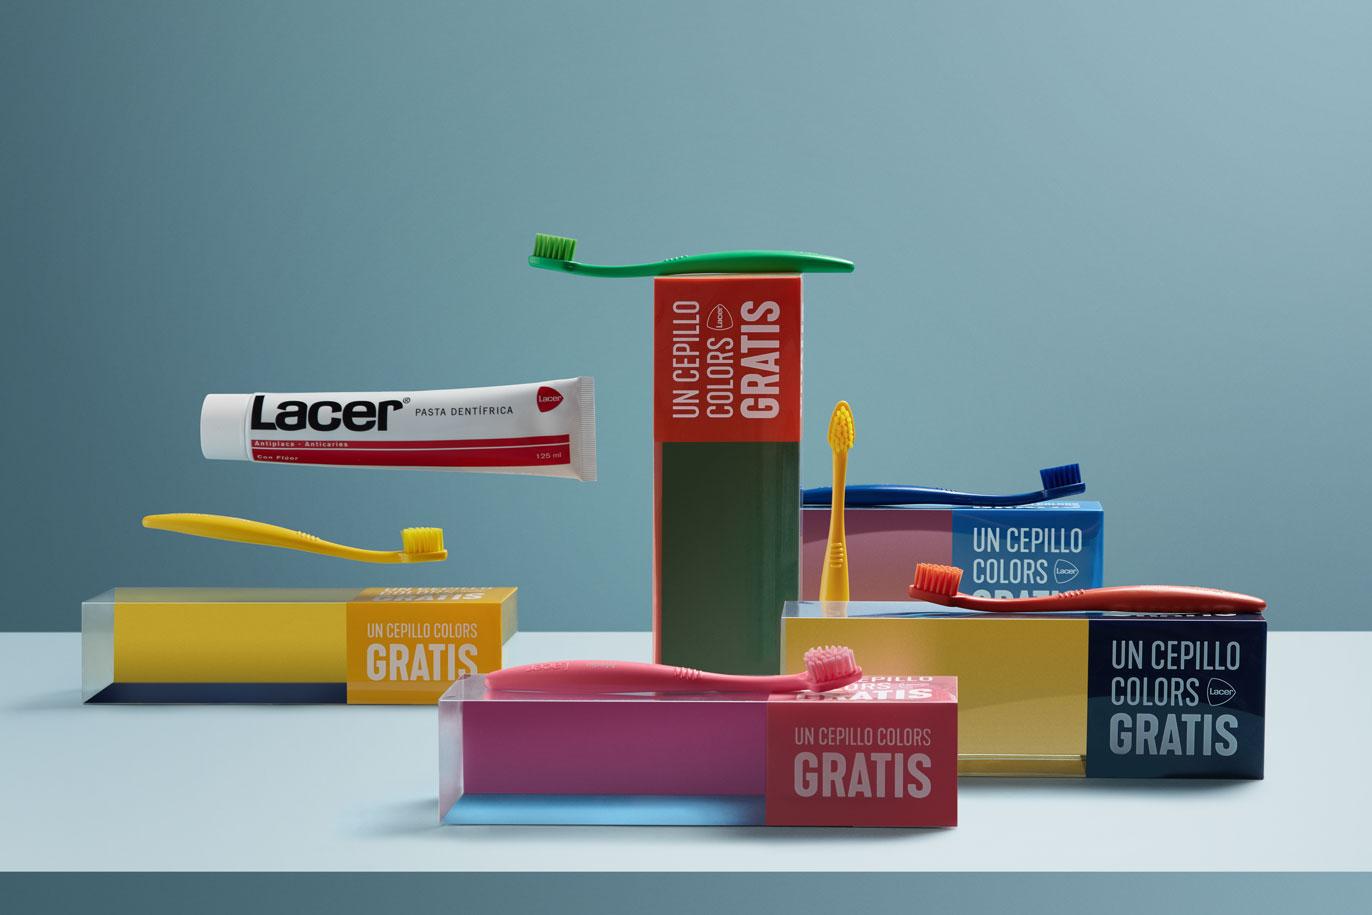 Laboratorios Lacer comunicación gráfica diseño de packaging promocional